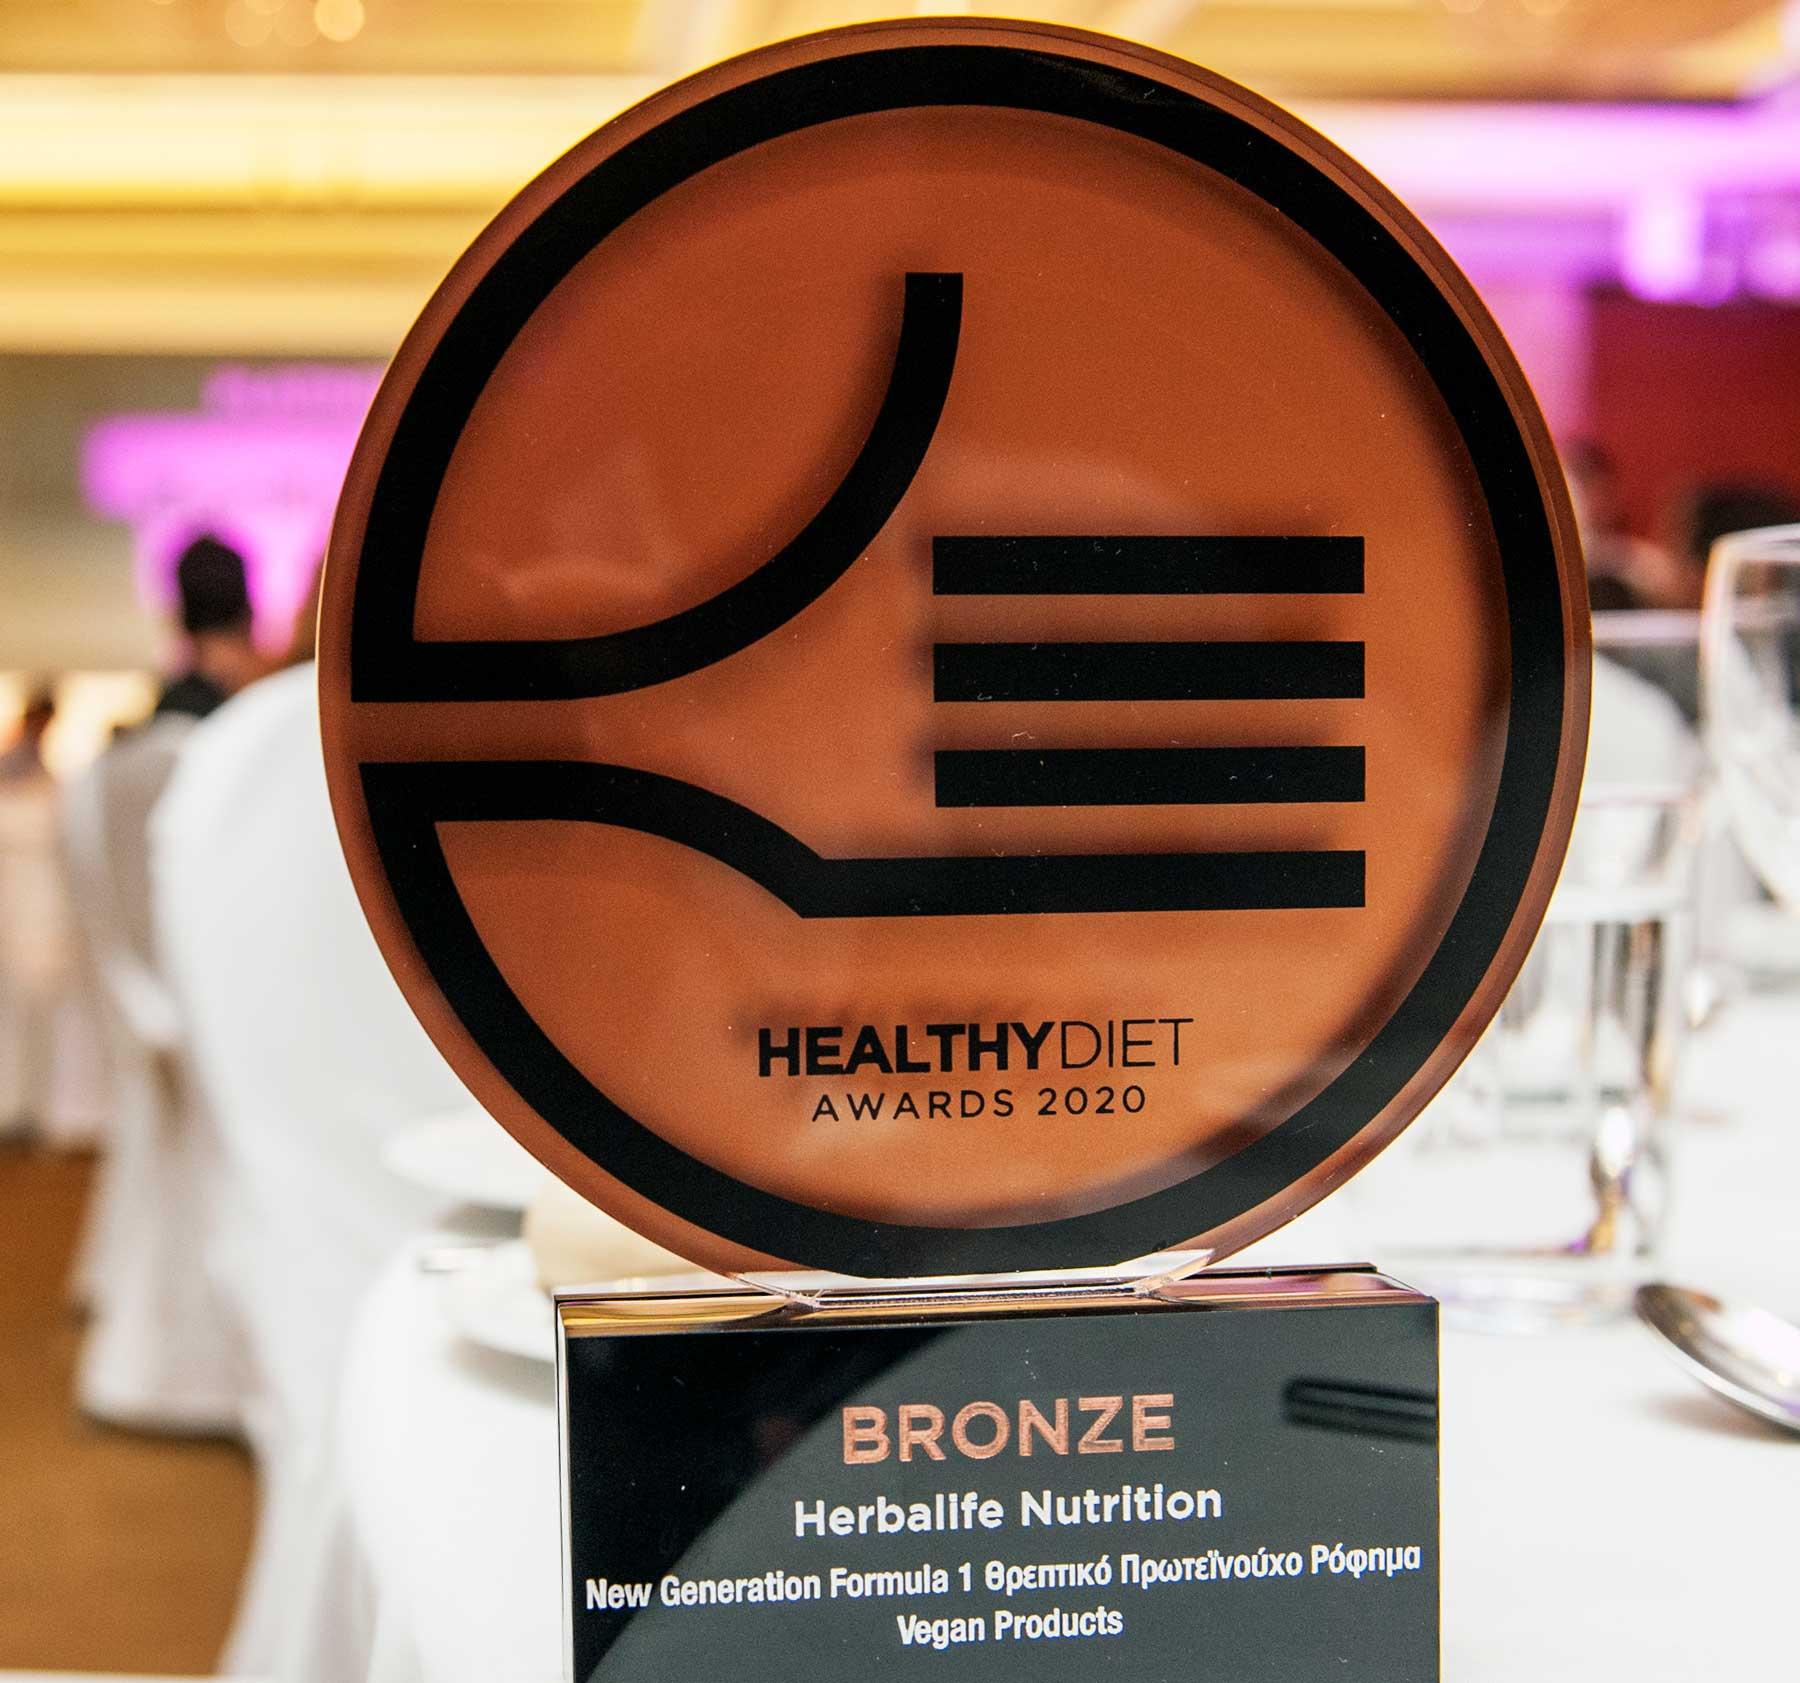 Herbalife Nutrition Healthy Diet Awards